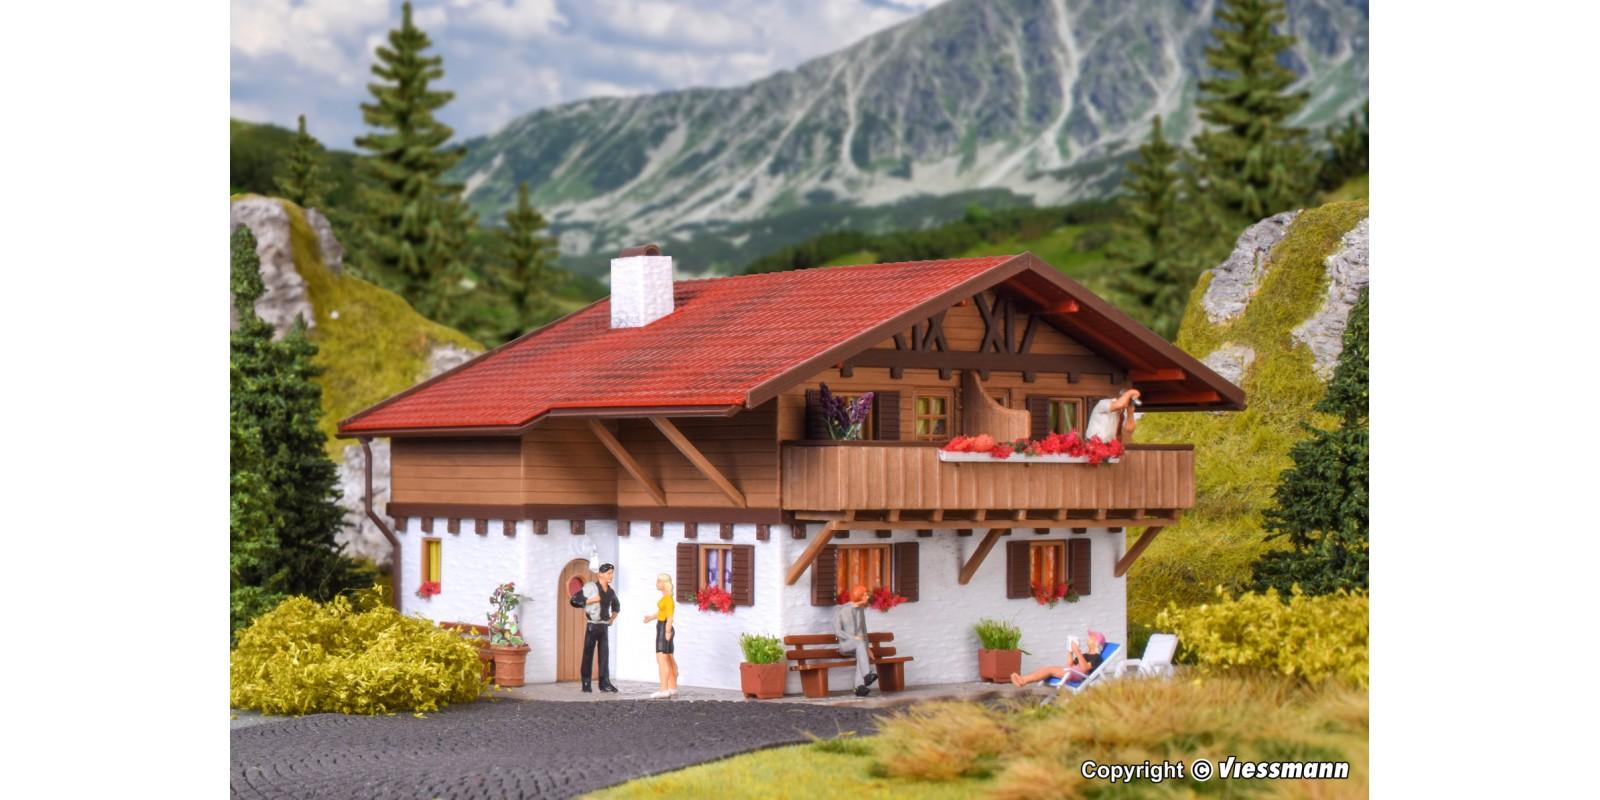 VO43702 H0 House Alpenrose